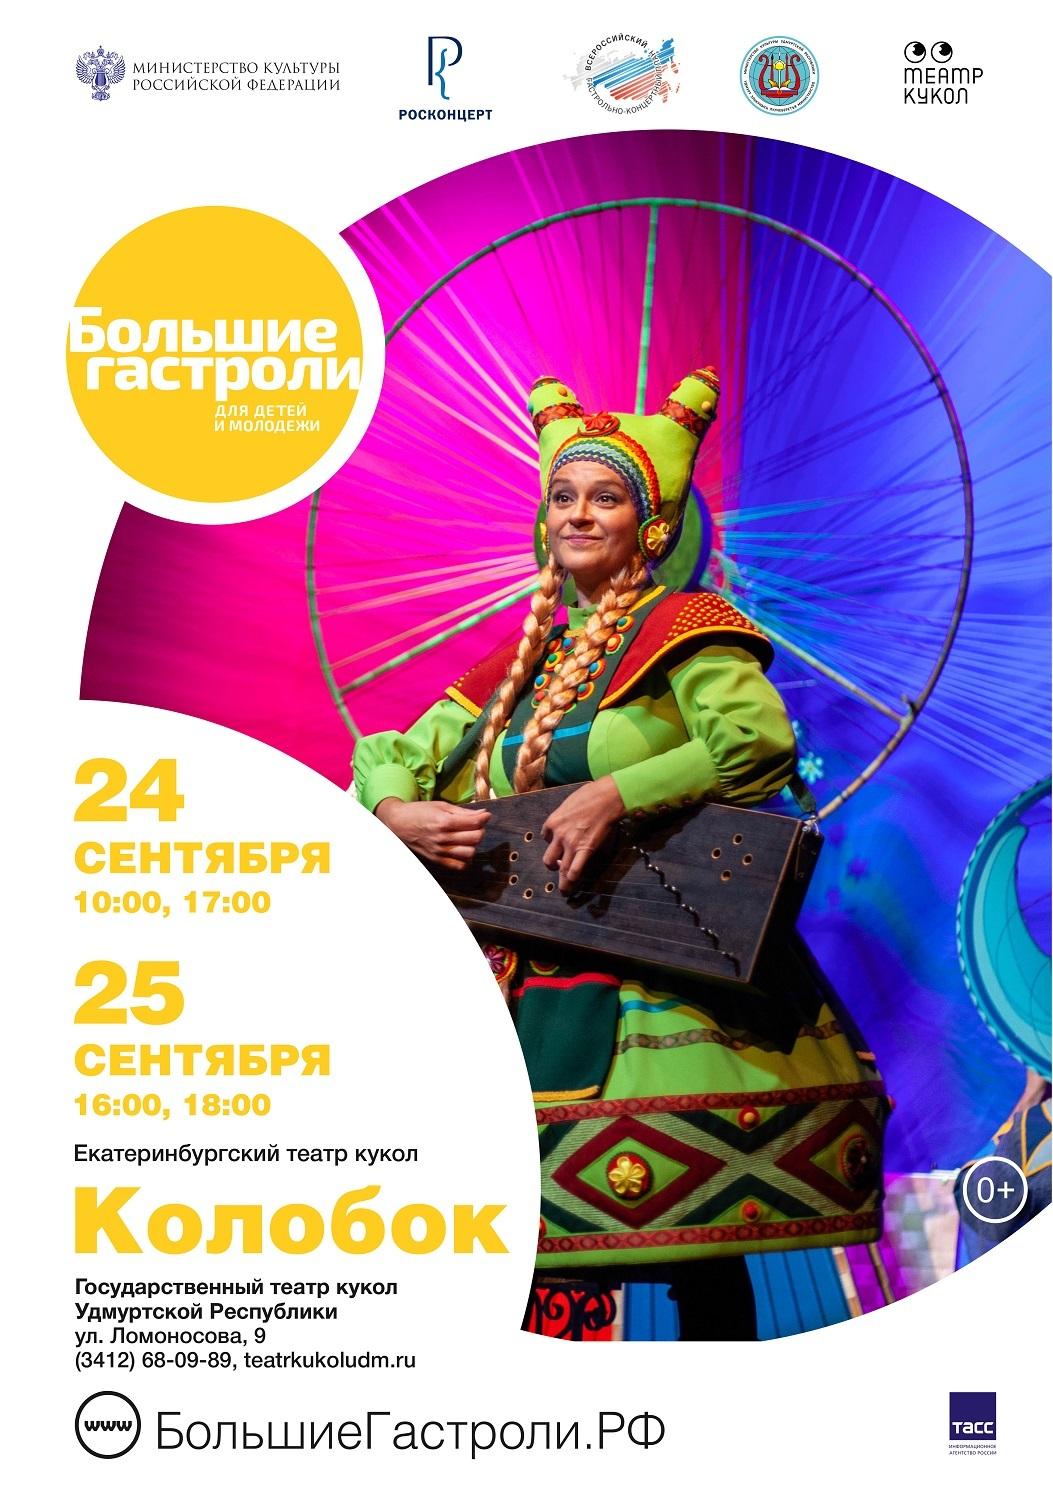 Колобок, гастроли Екатеринбургского театра кукол